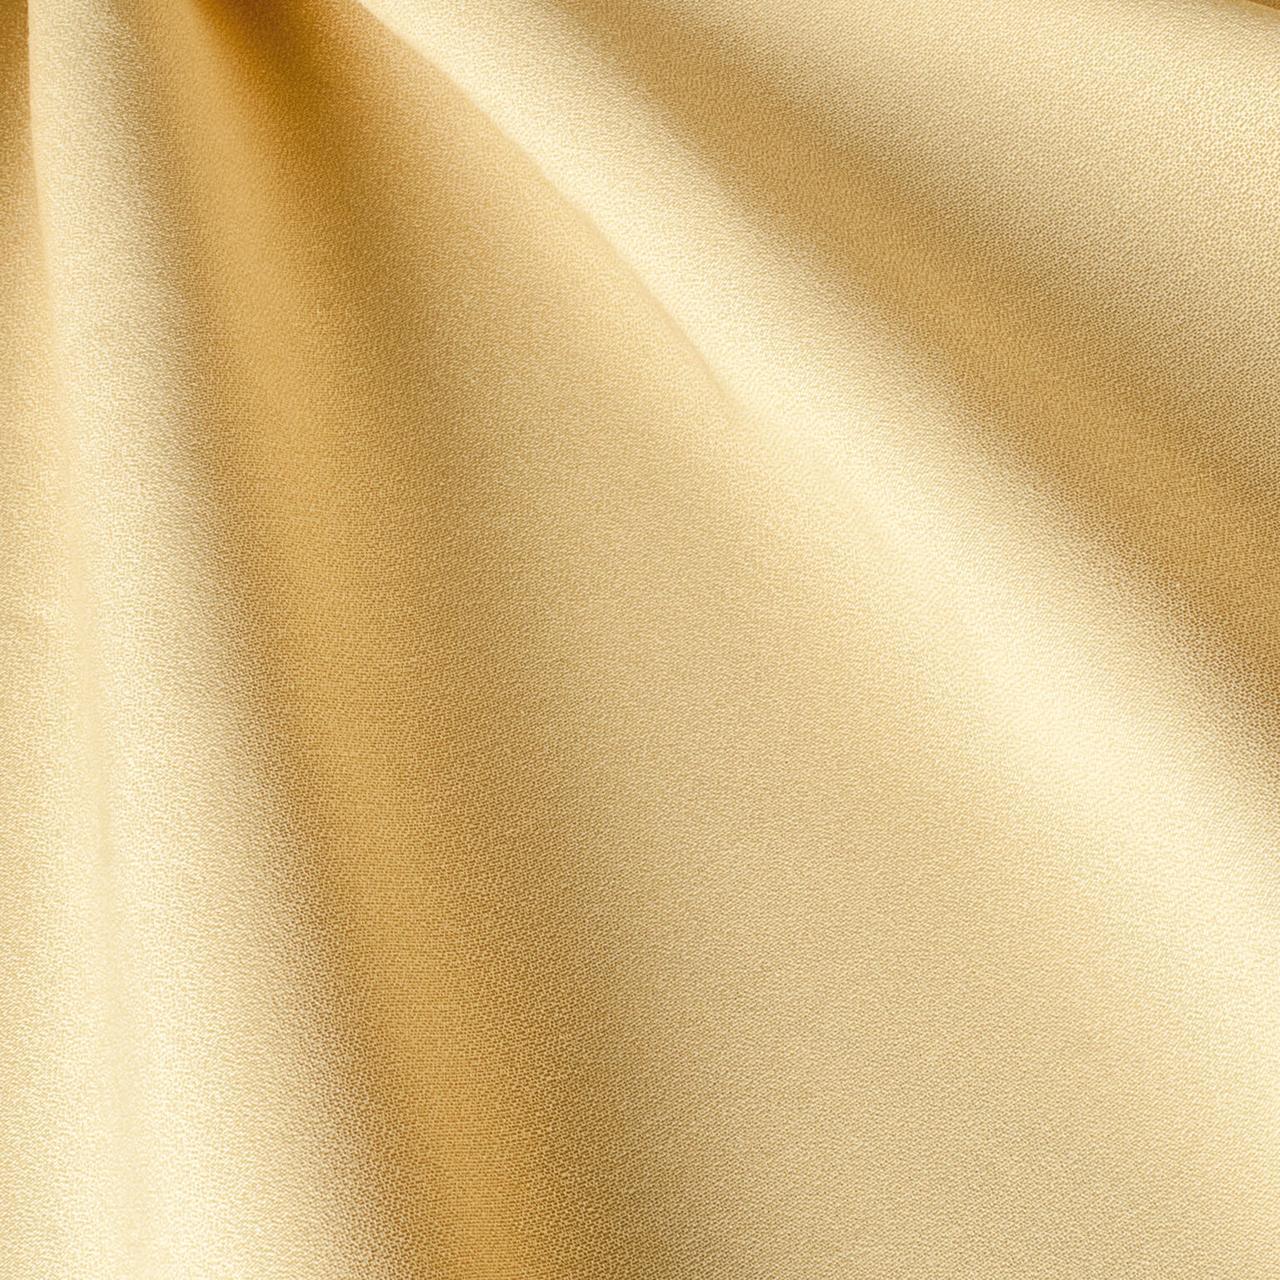 Ткань для скатертей и салфеток (ресторан) 83105v3